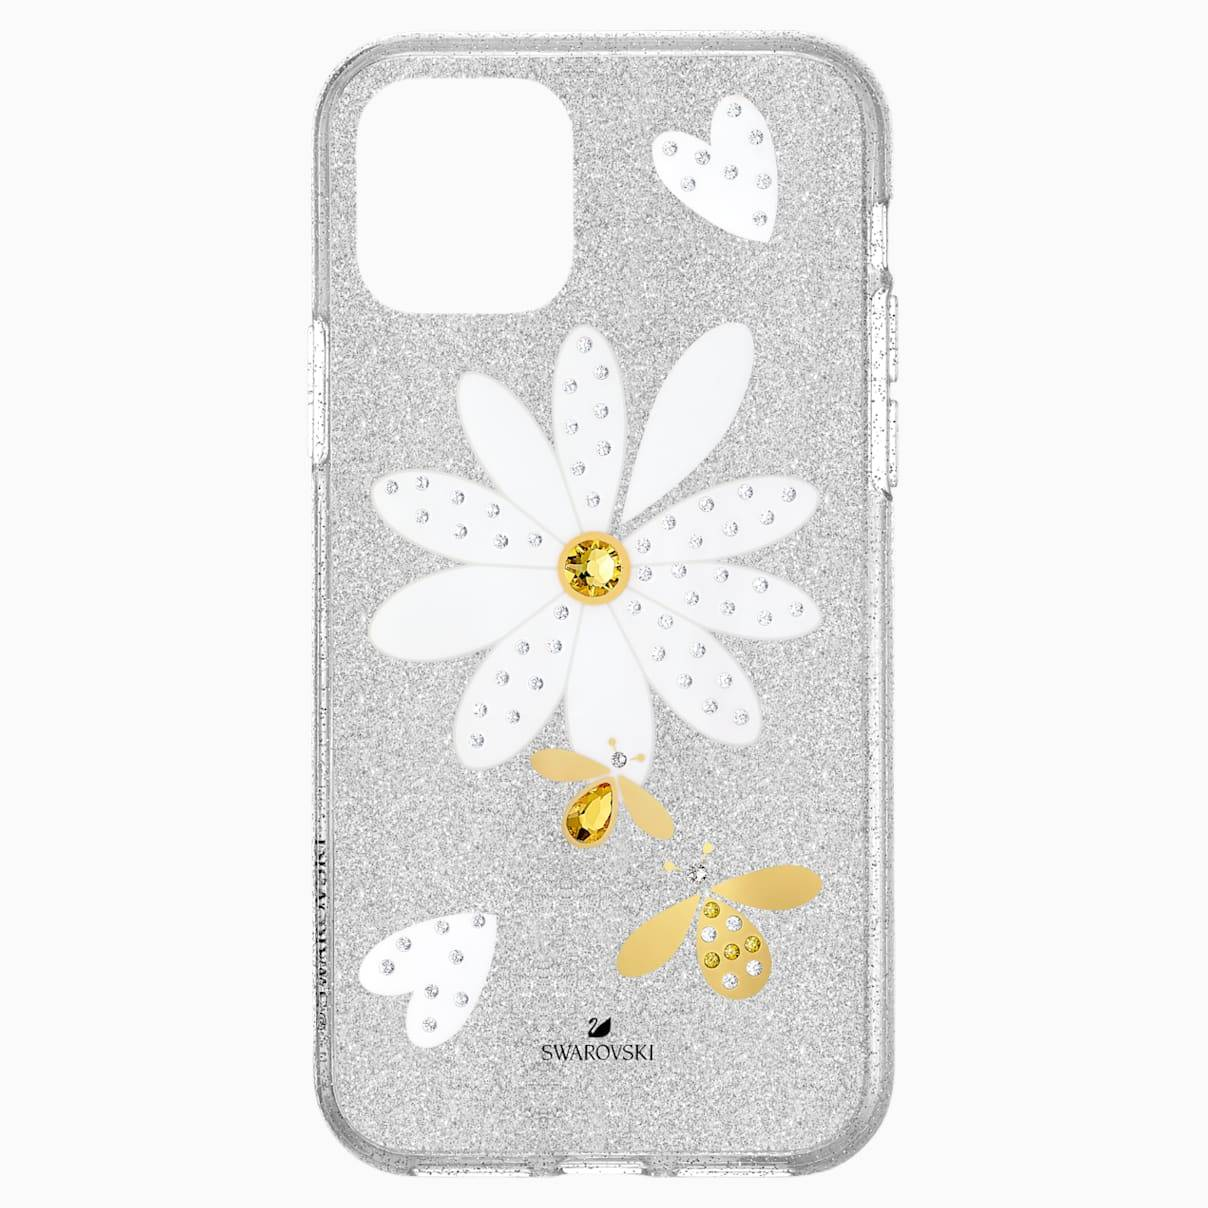 Swarovski Eternal Flower Smartphone Case with Bumper, iPhone® 11 Pro, Light multi-colored